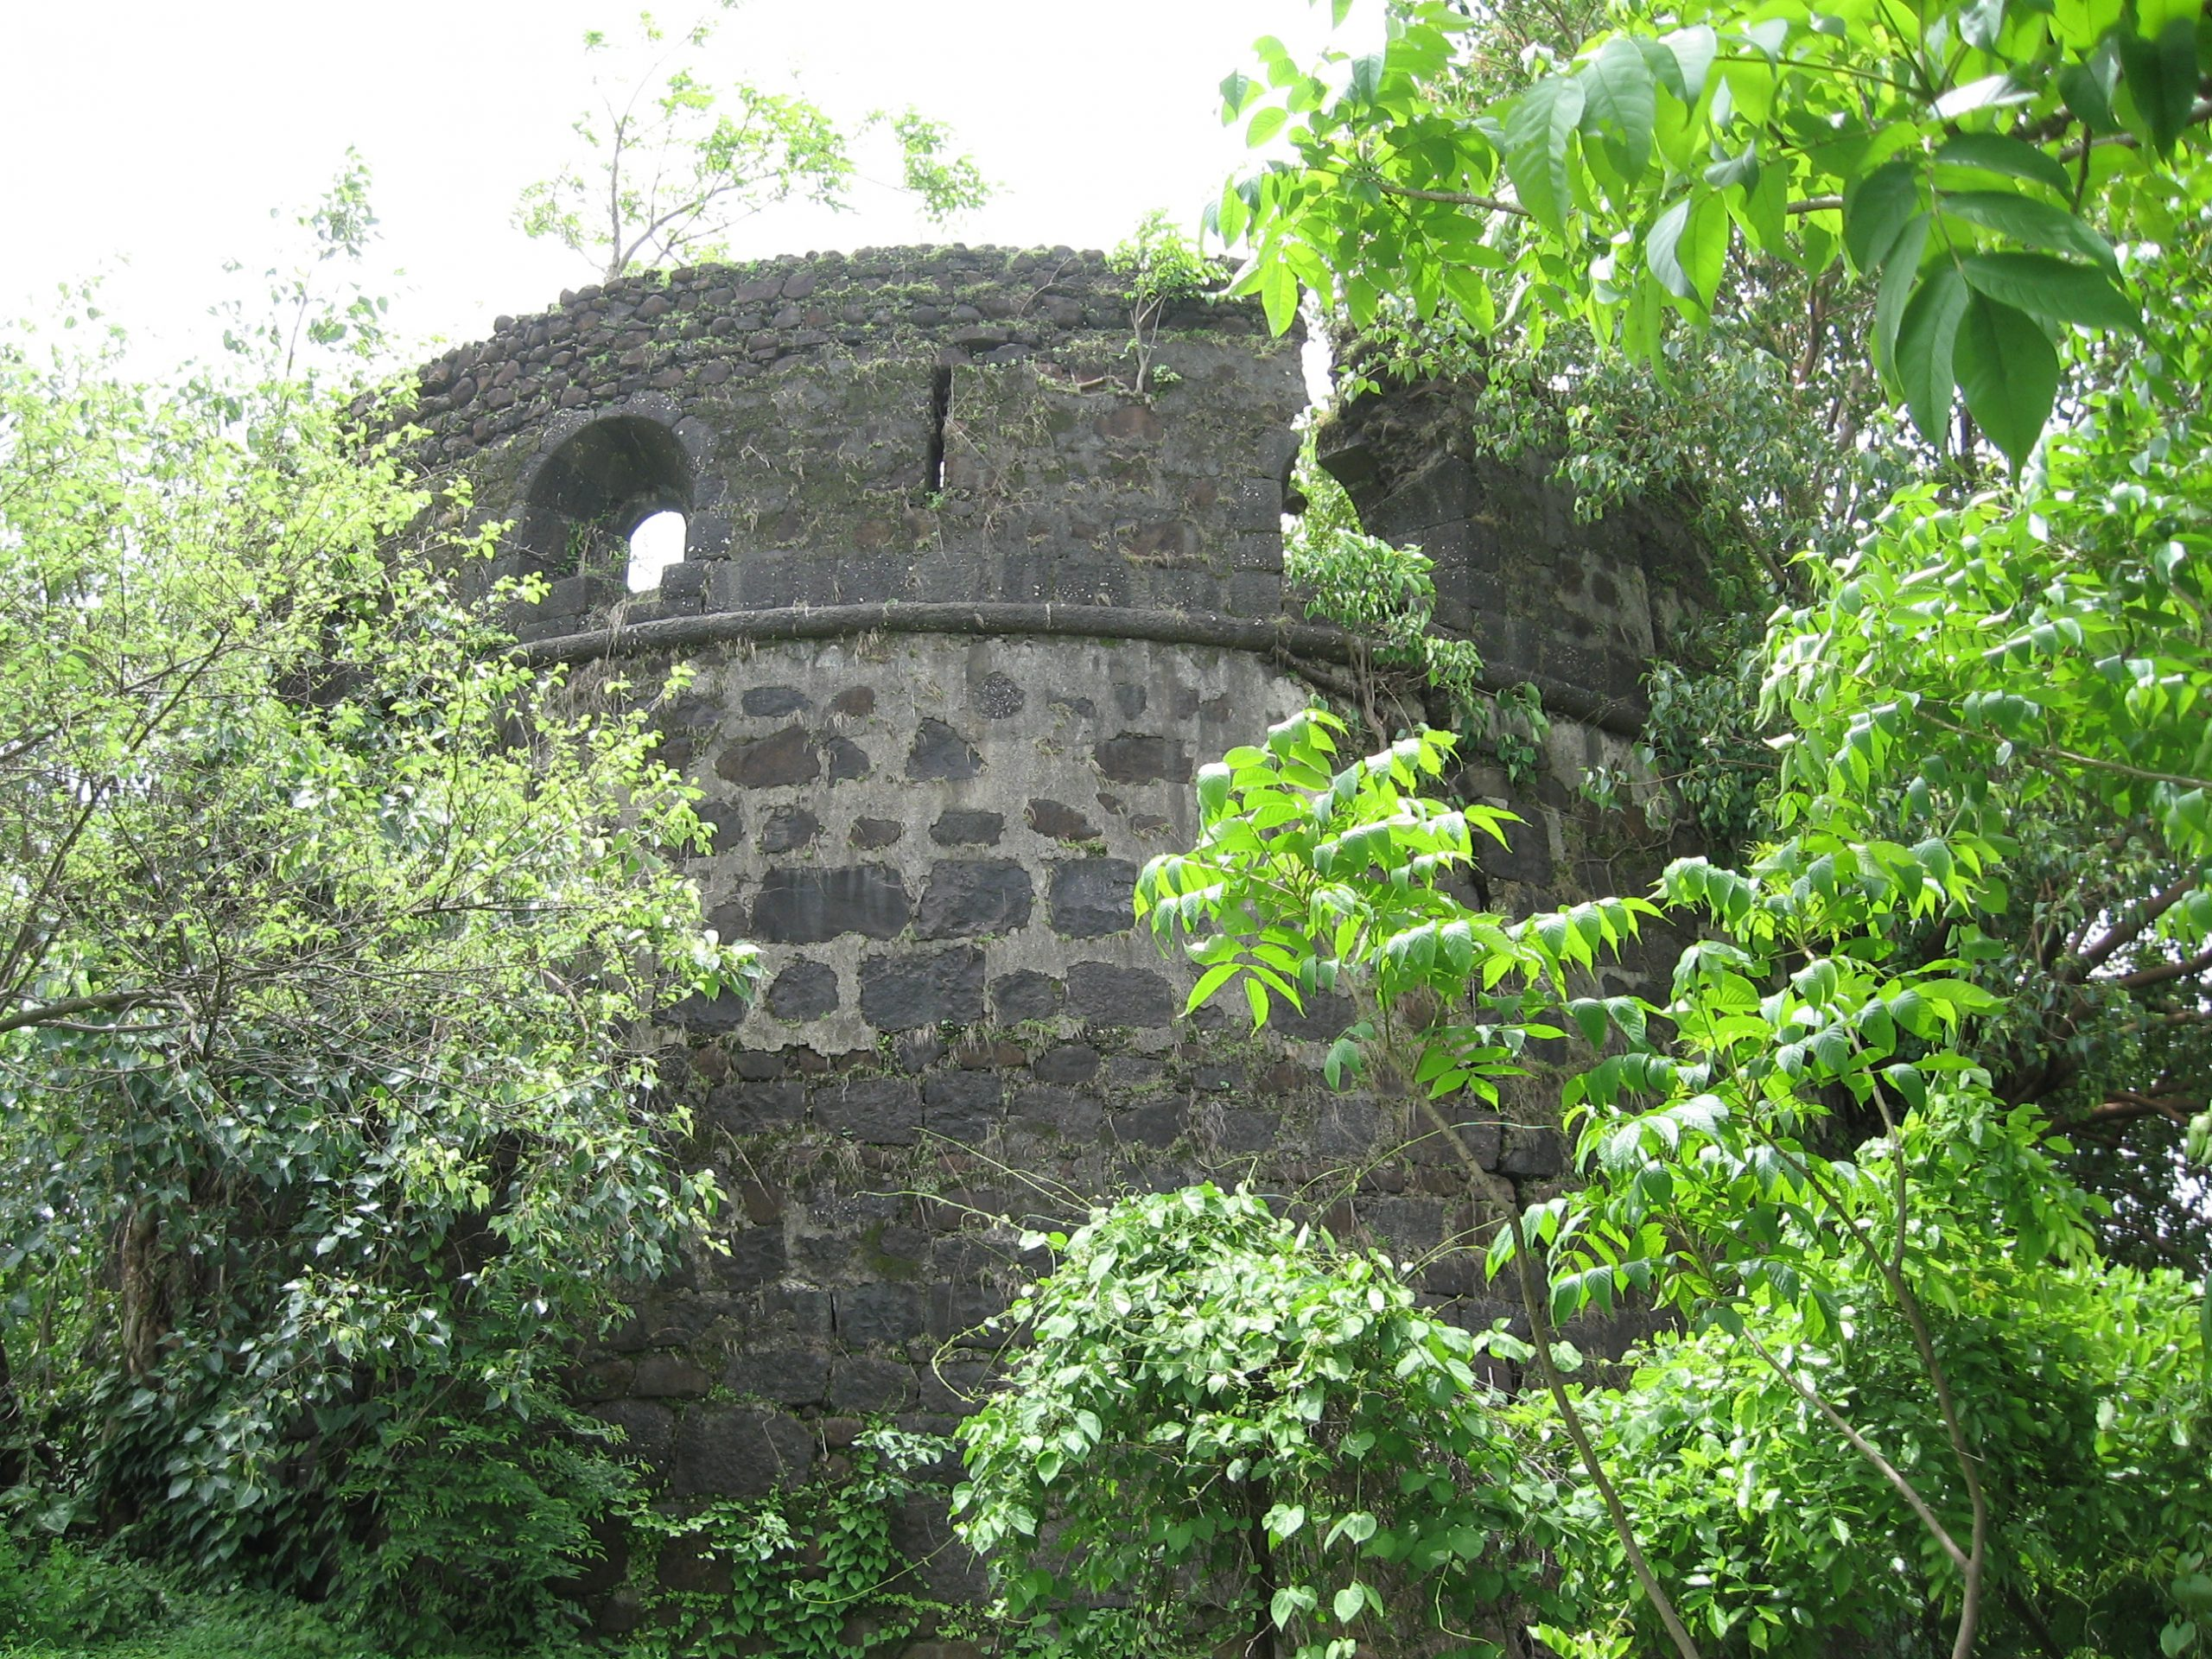 Belapur Fort: In the Heart of Navi Mumbai at CBD Belapur